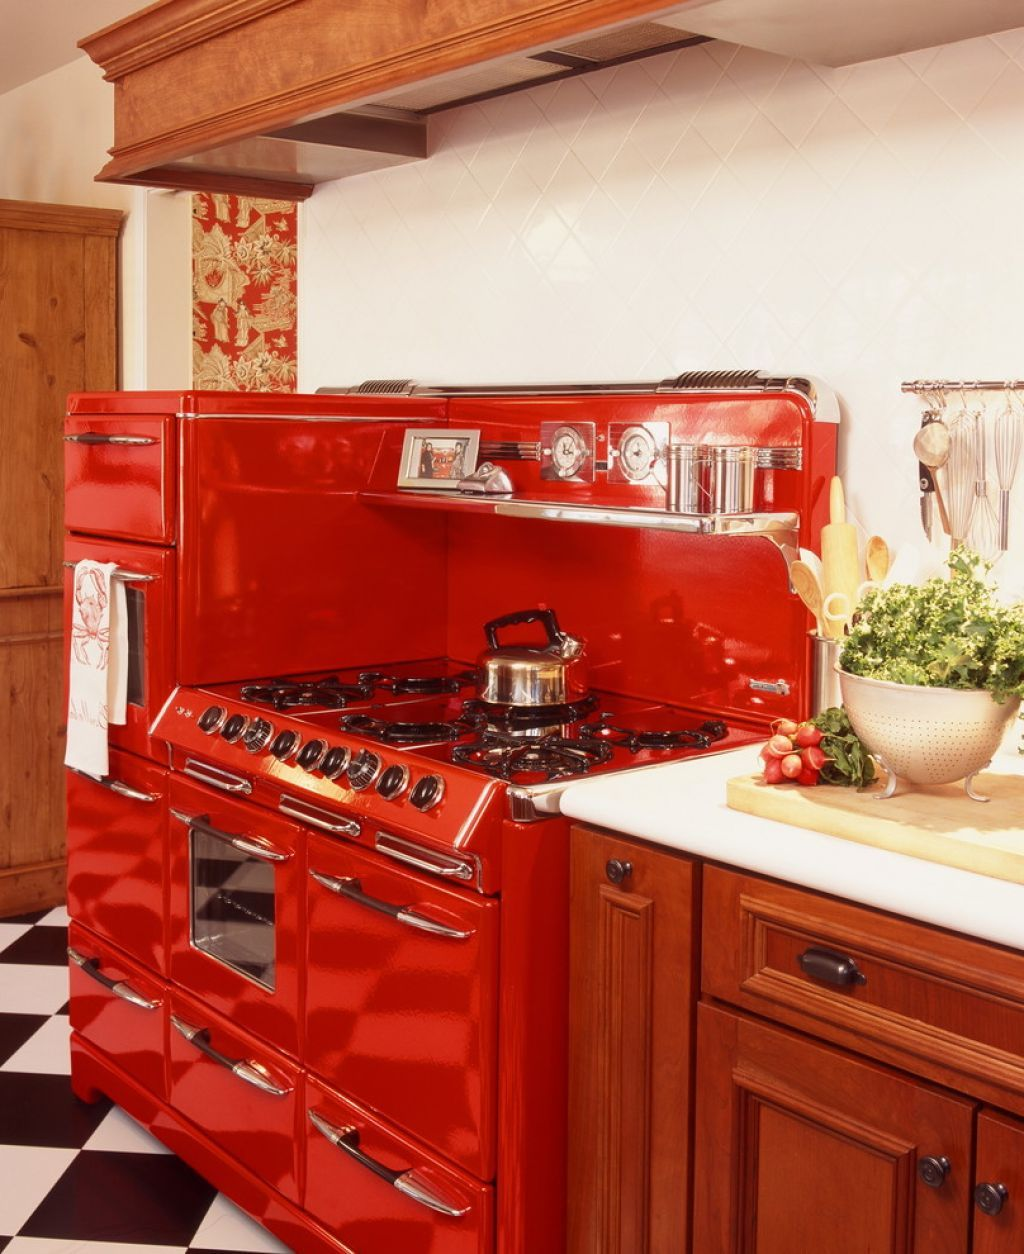 Kitchen Remodel 101 Stunning Ideas For Your Kitchen Design: Kitchen , Retro Style Kitchen Decor Put Your 1950's